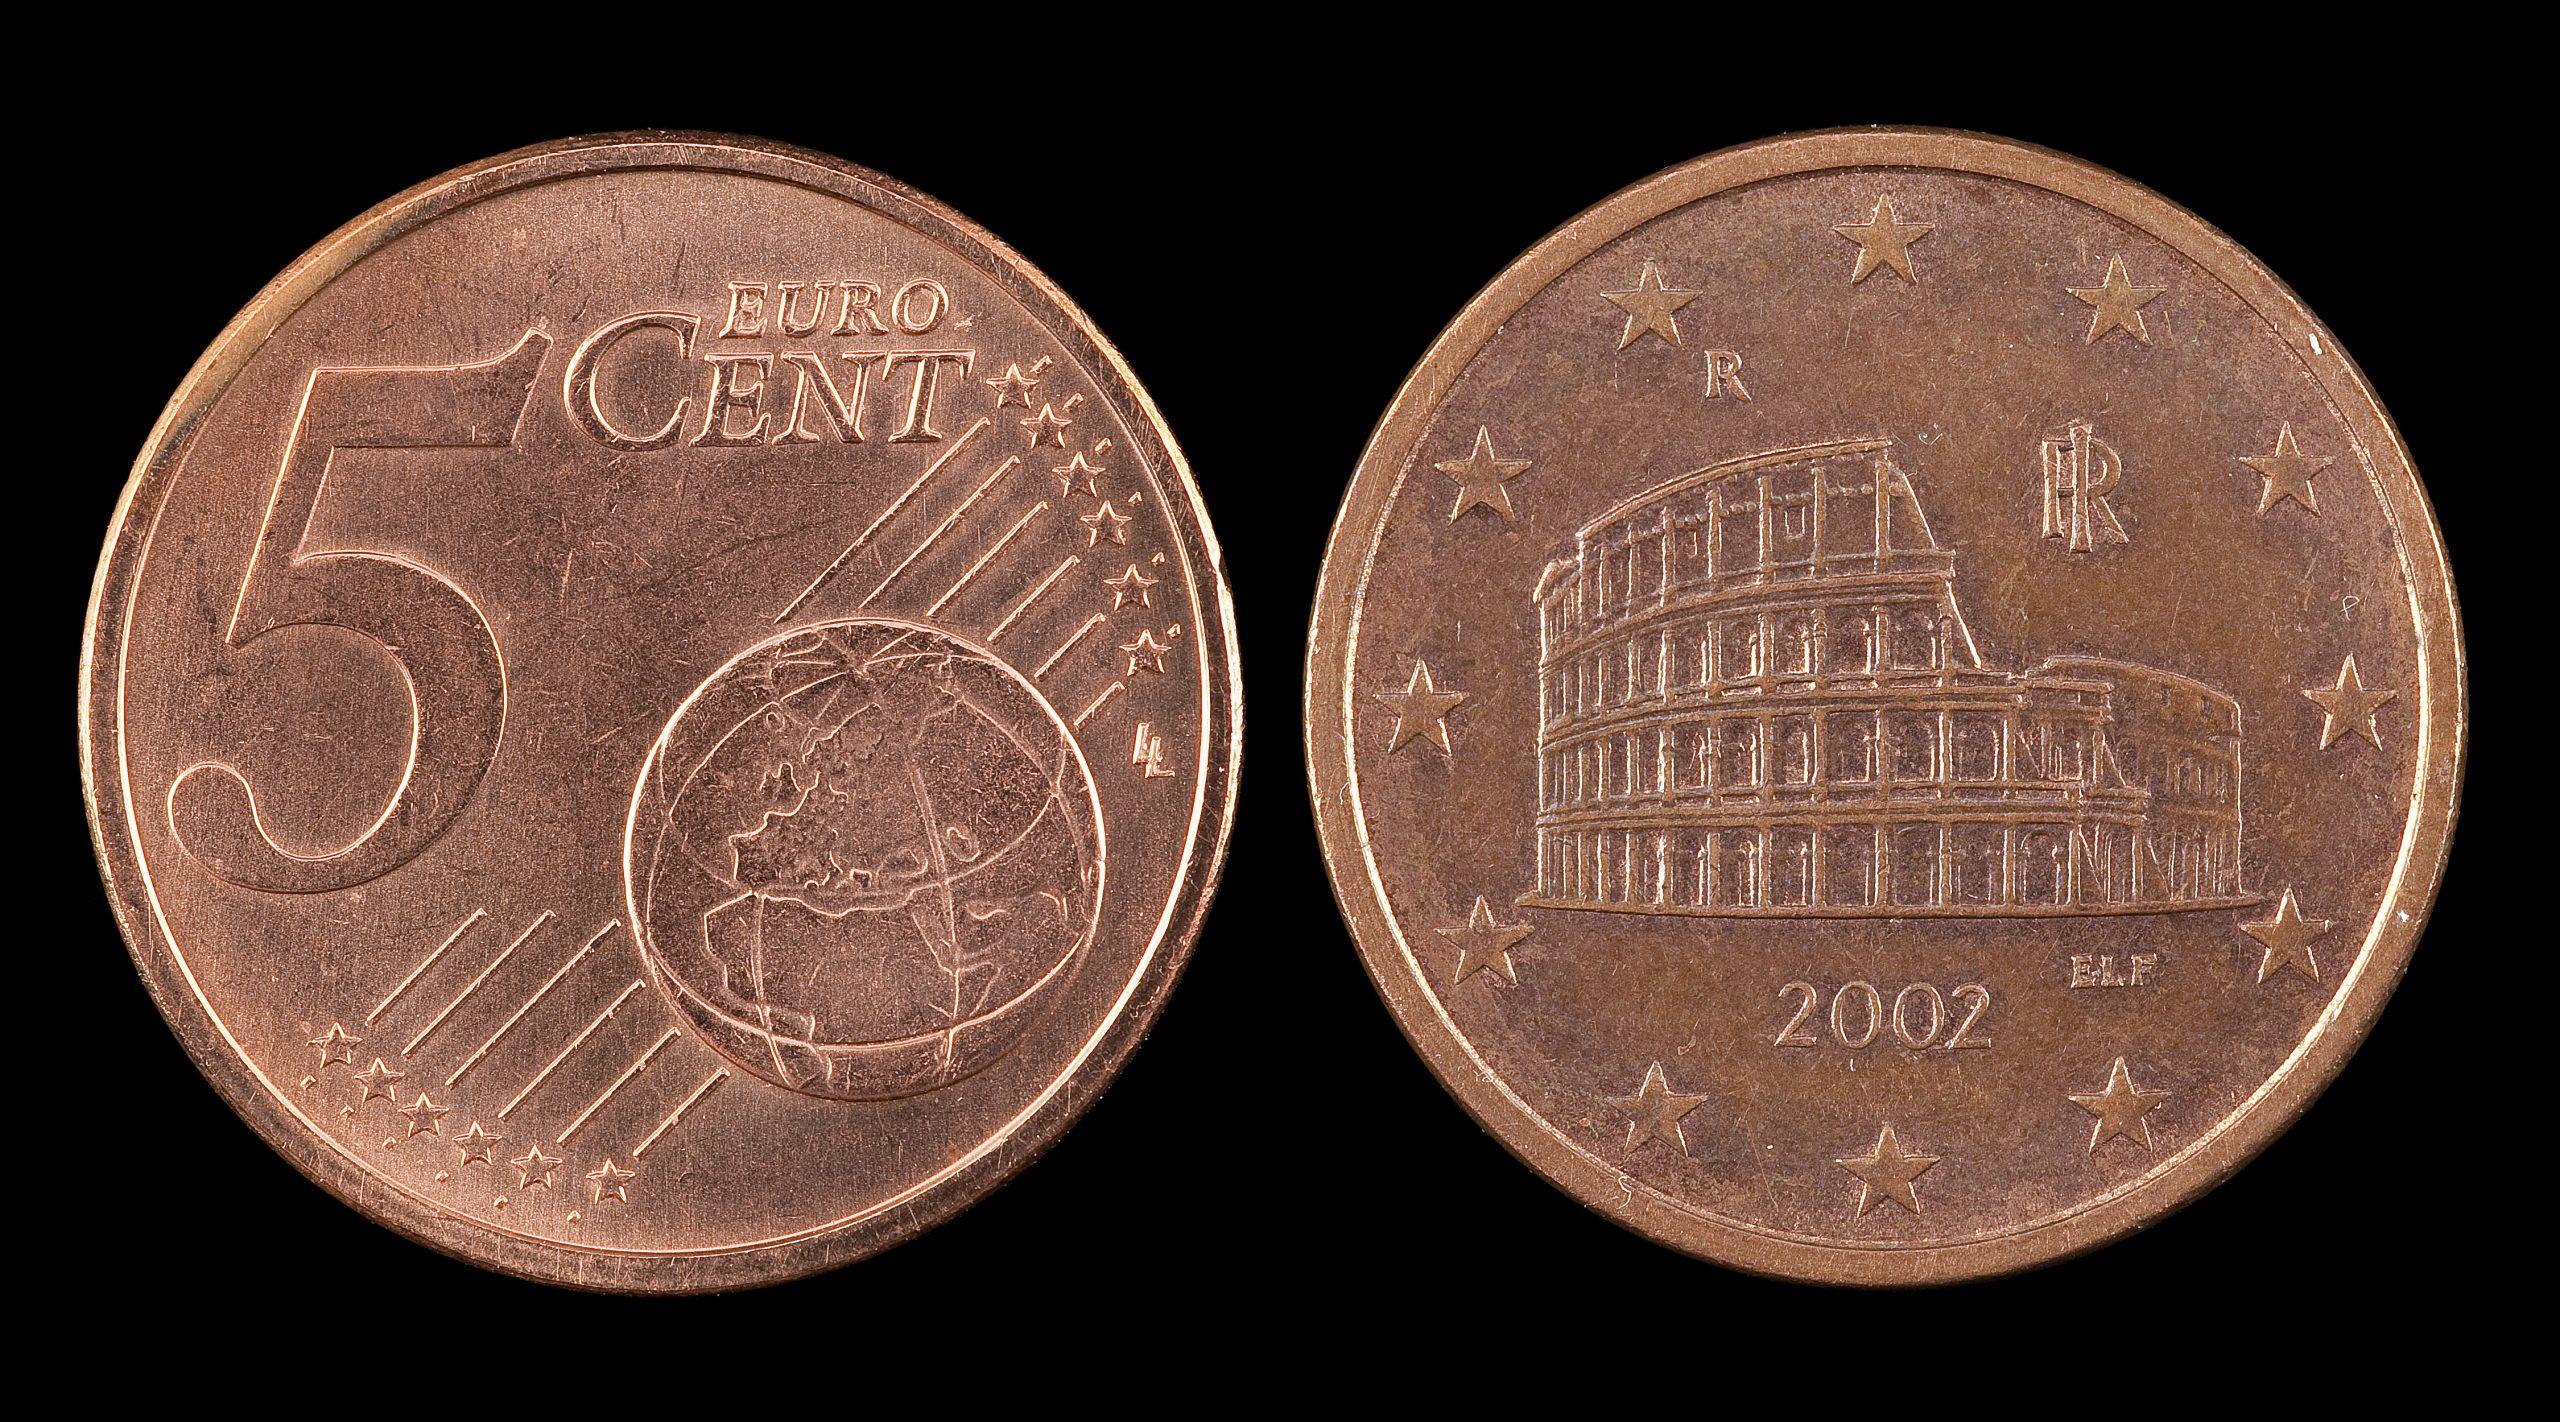 Colosseum euro coin_Rome (5)